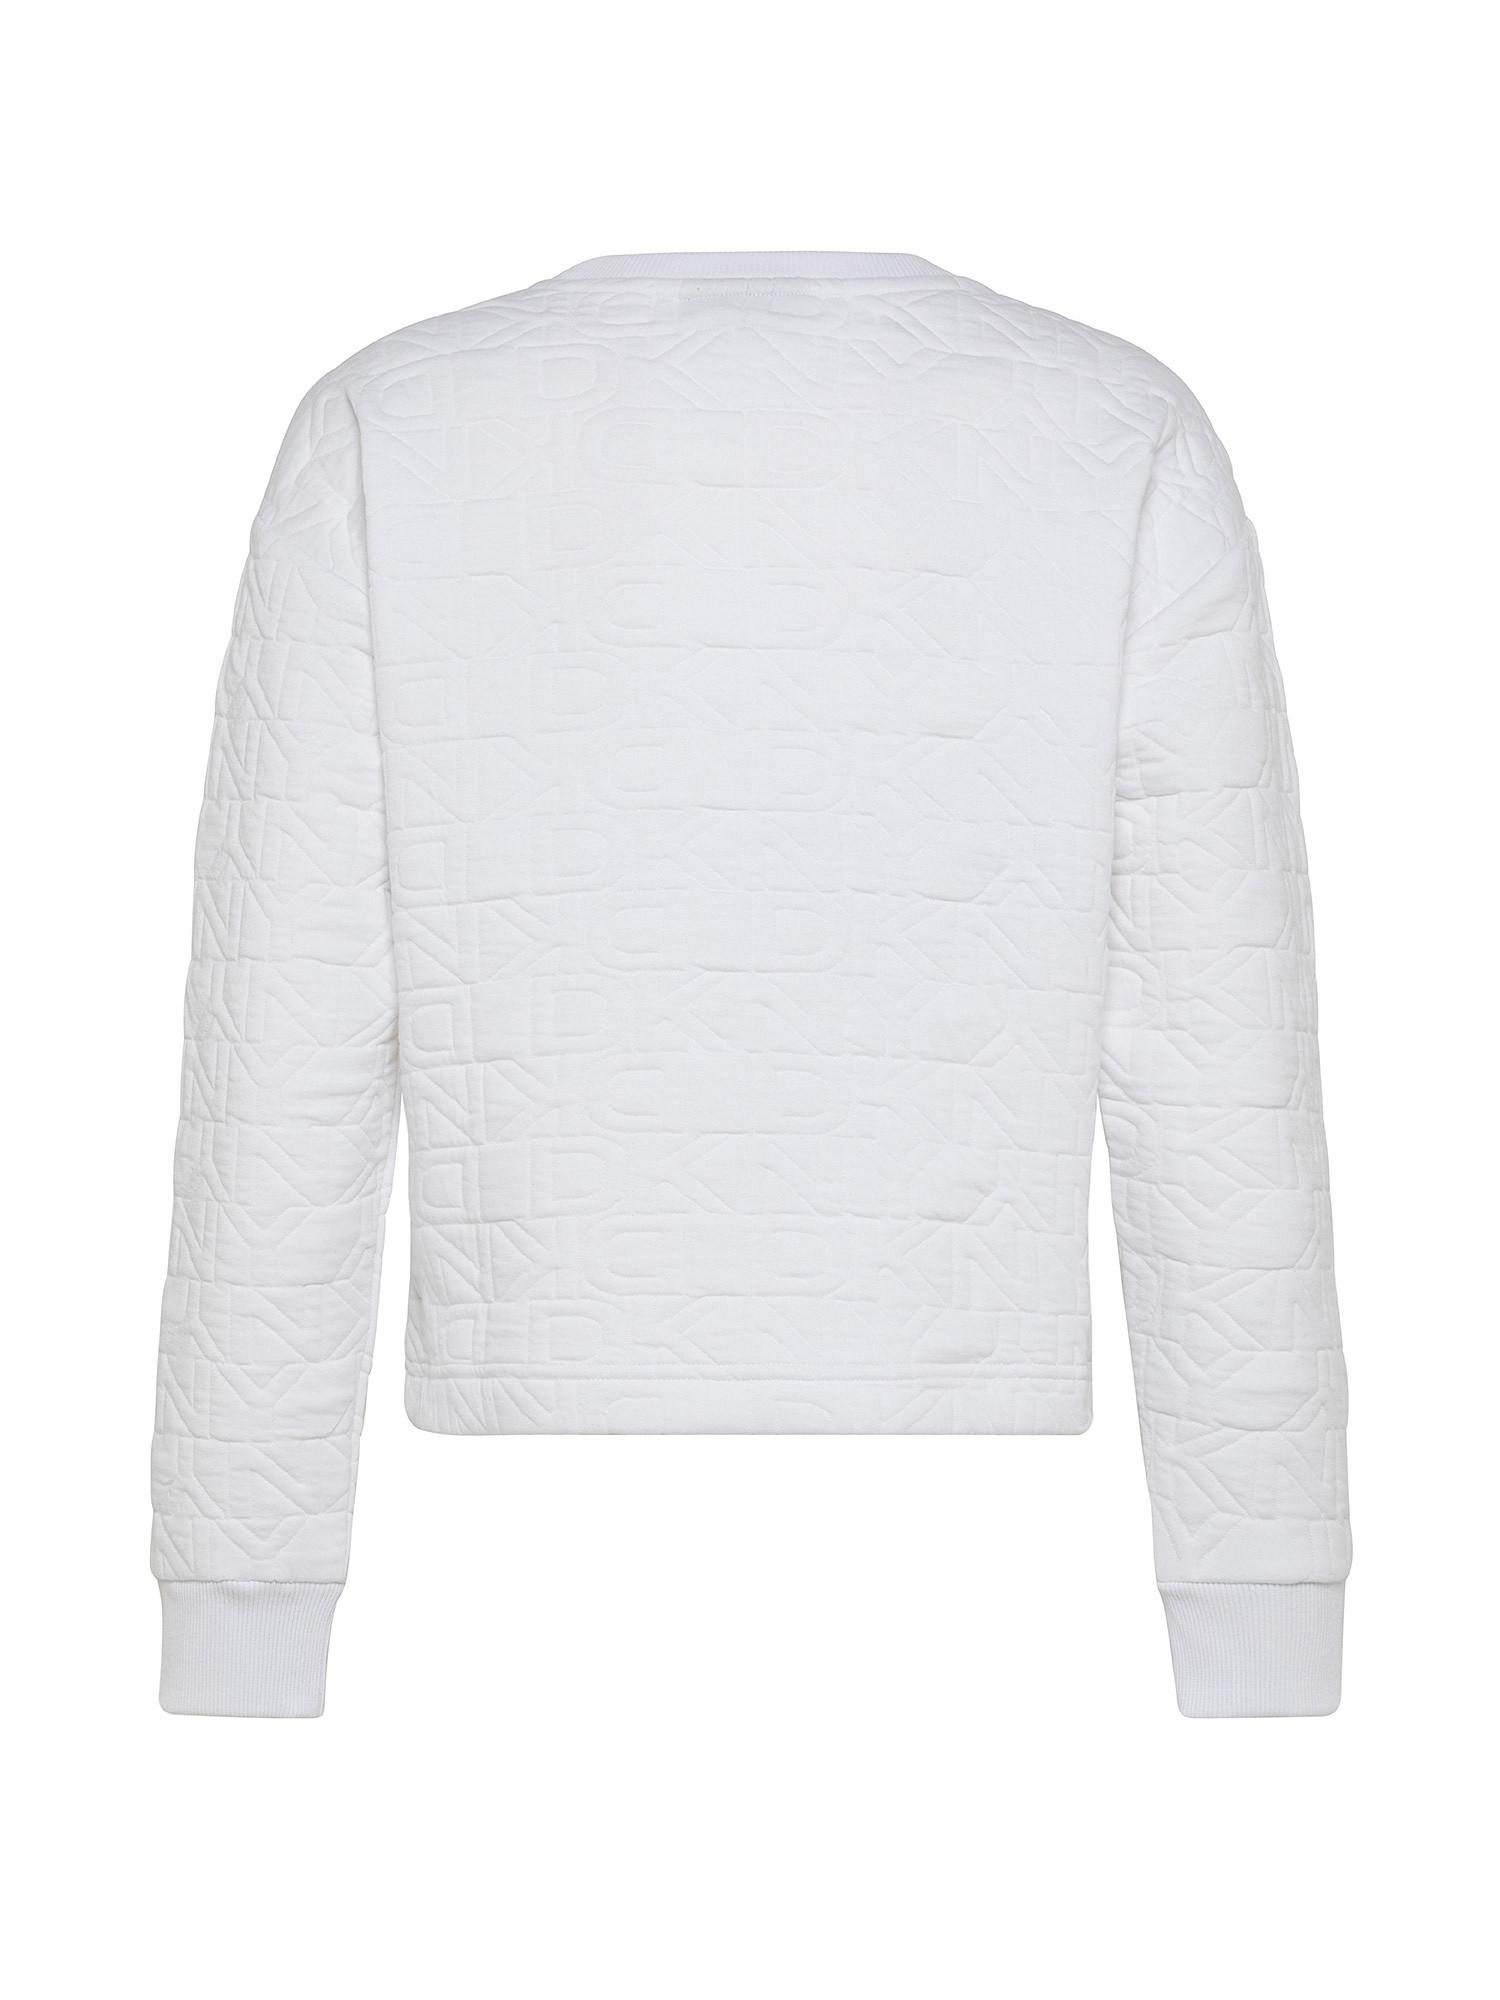 Felpa girocollo con logo ricamato, Bianco, large image number 1